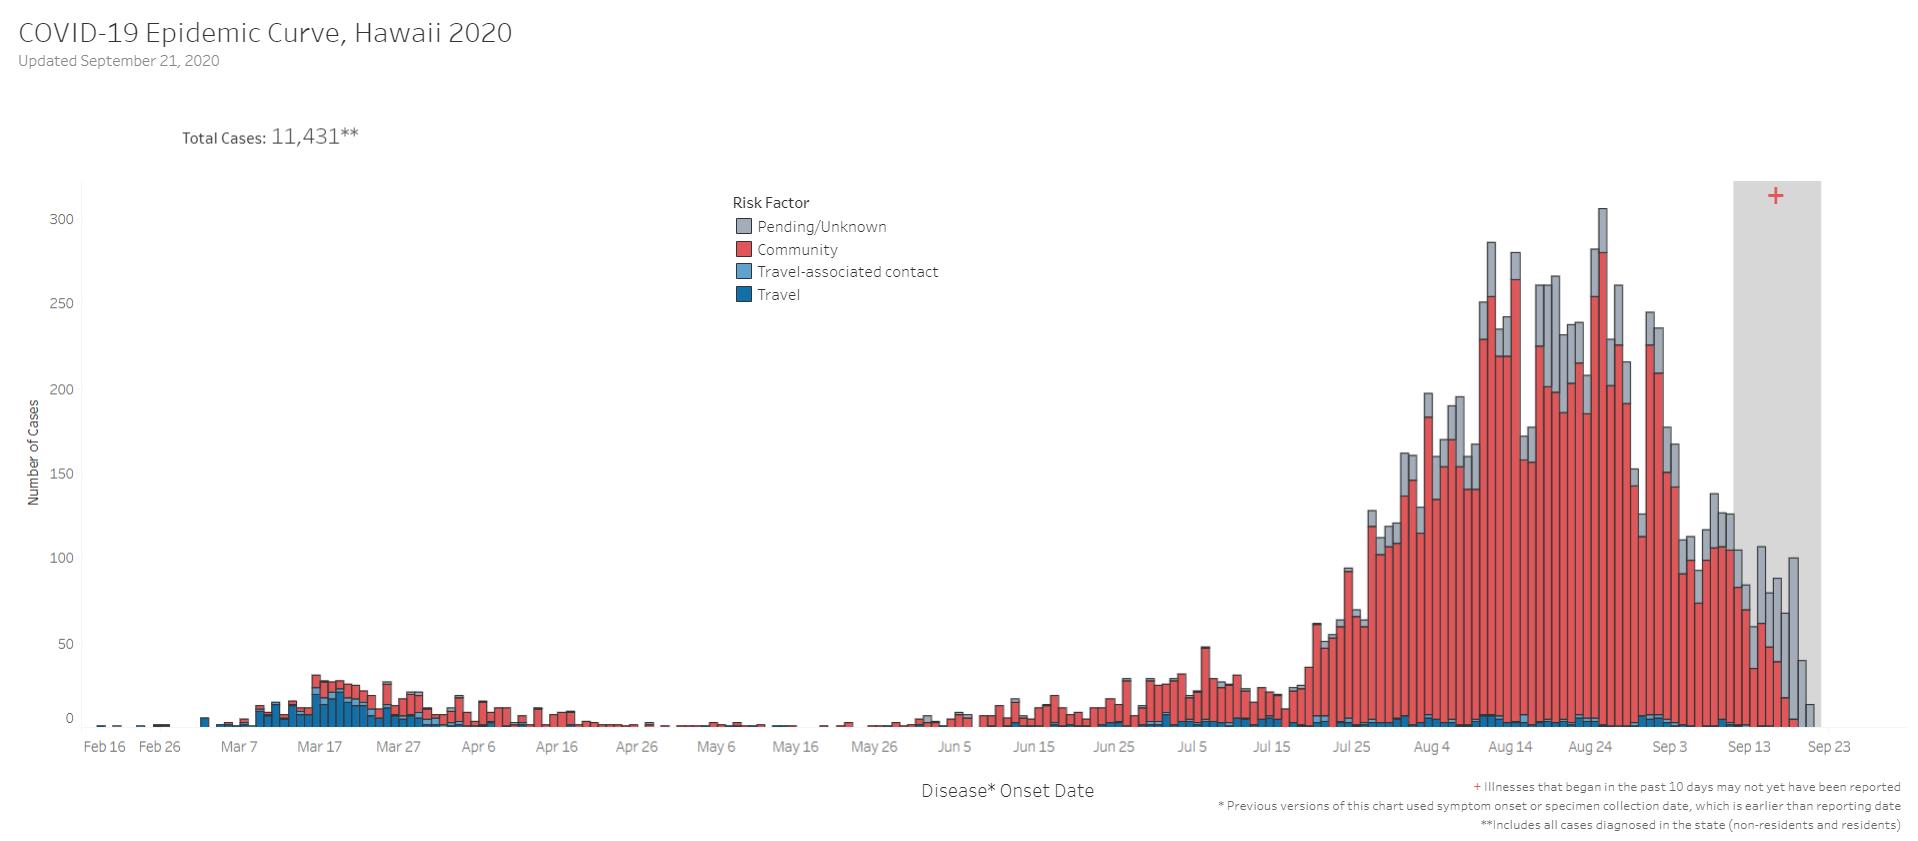 COVID-19 Epidemic Curve Hawaii September 21, 2020